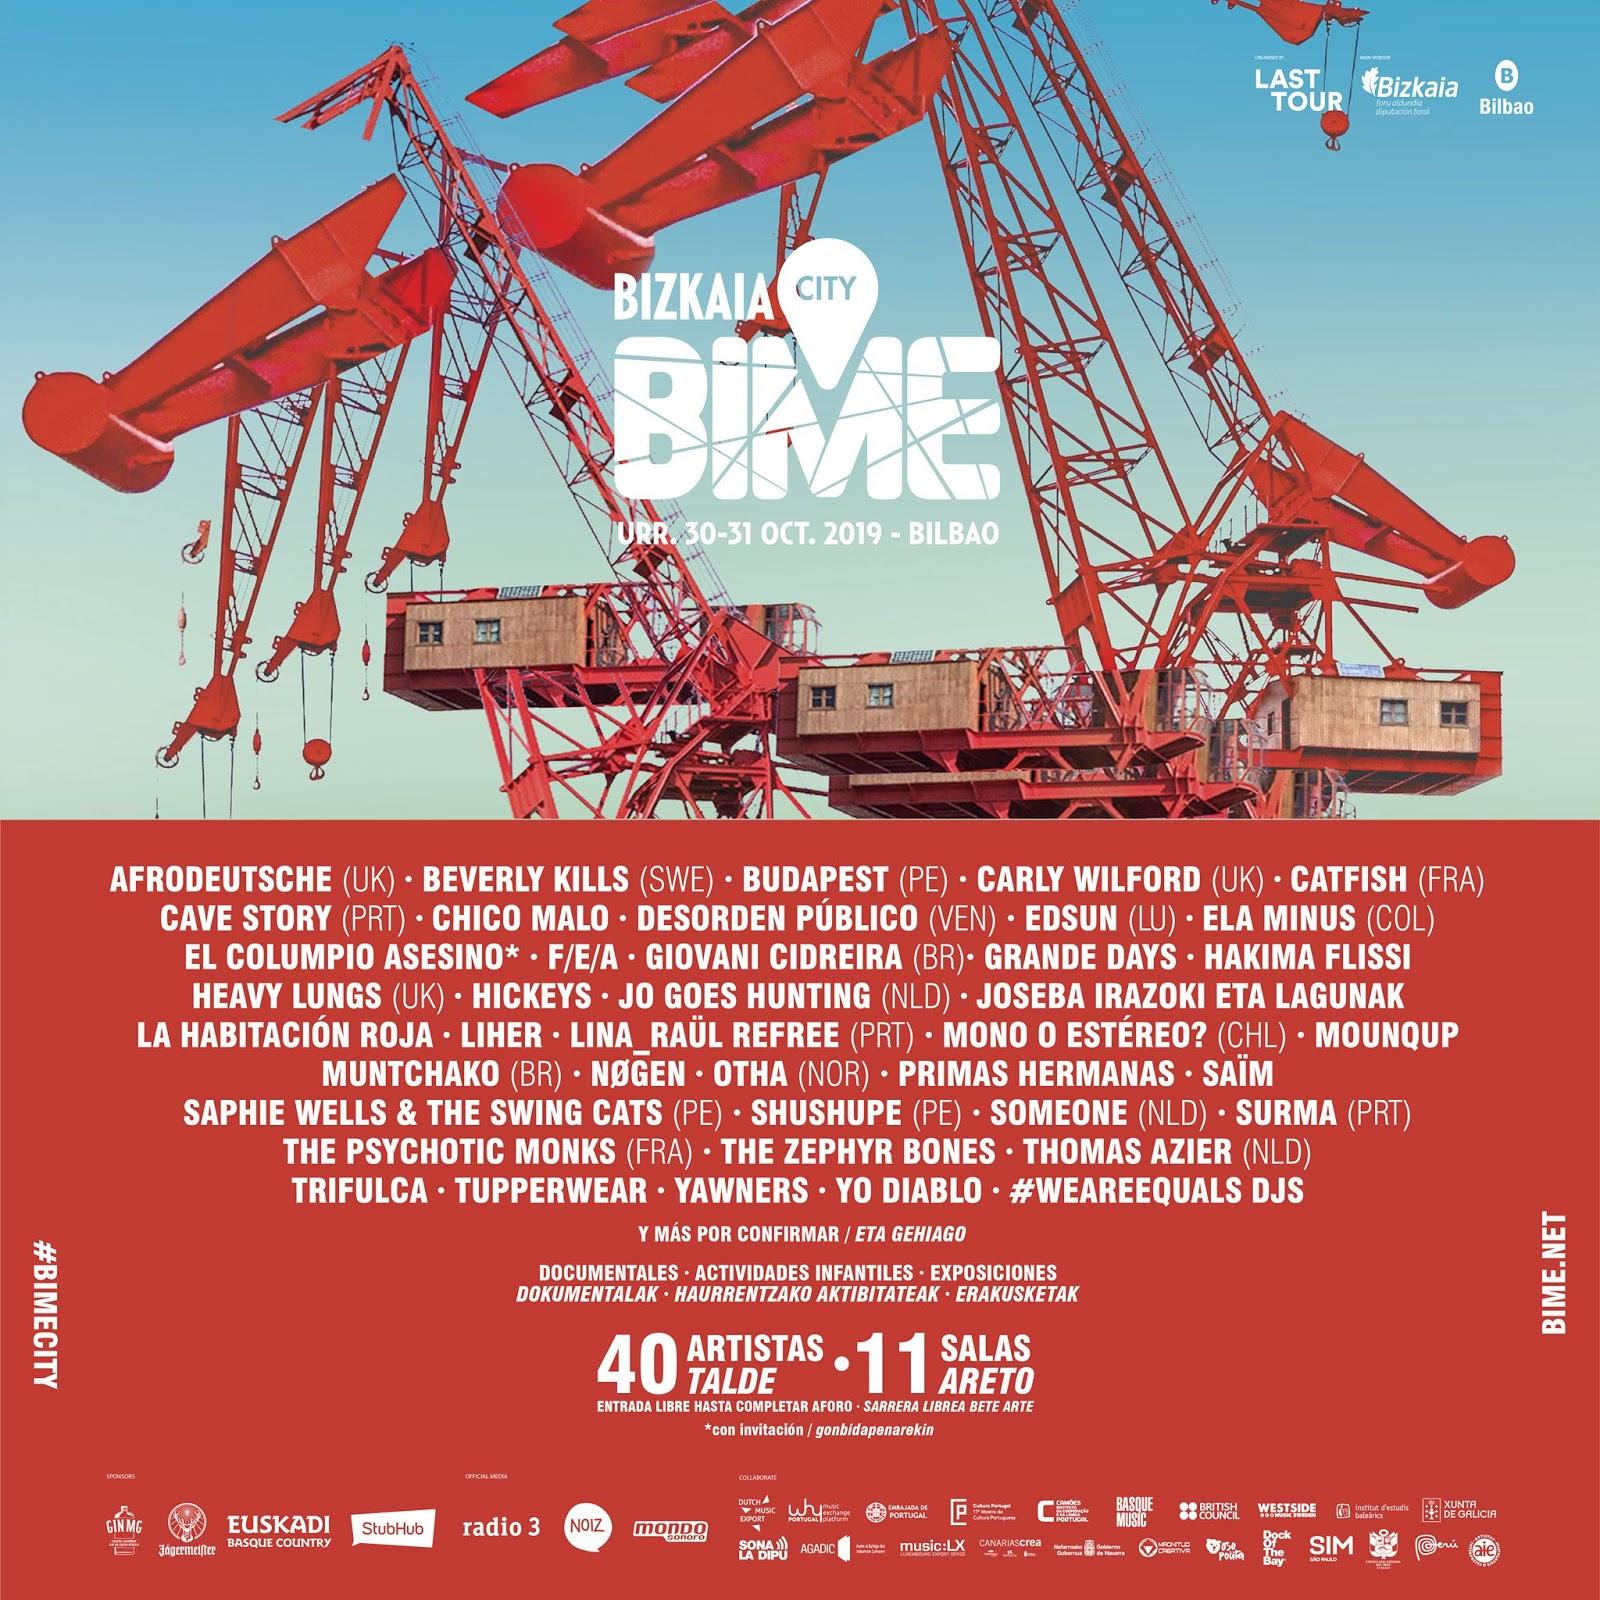 BIME 2019 Kraftwerk • Mark Lanegan • Amaia. - Página 11 Bime-city-bilbao-conciertos-gratis-columpio-asesino-habitacion-roja-2019